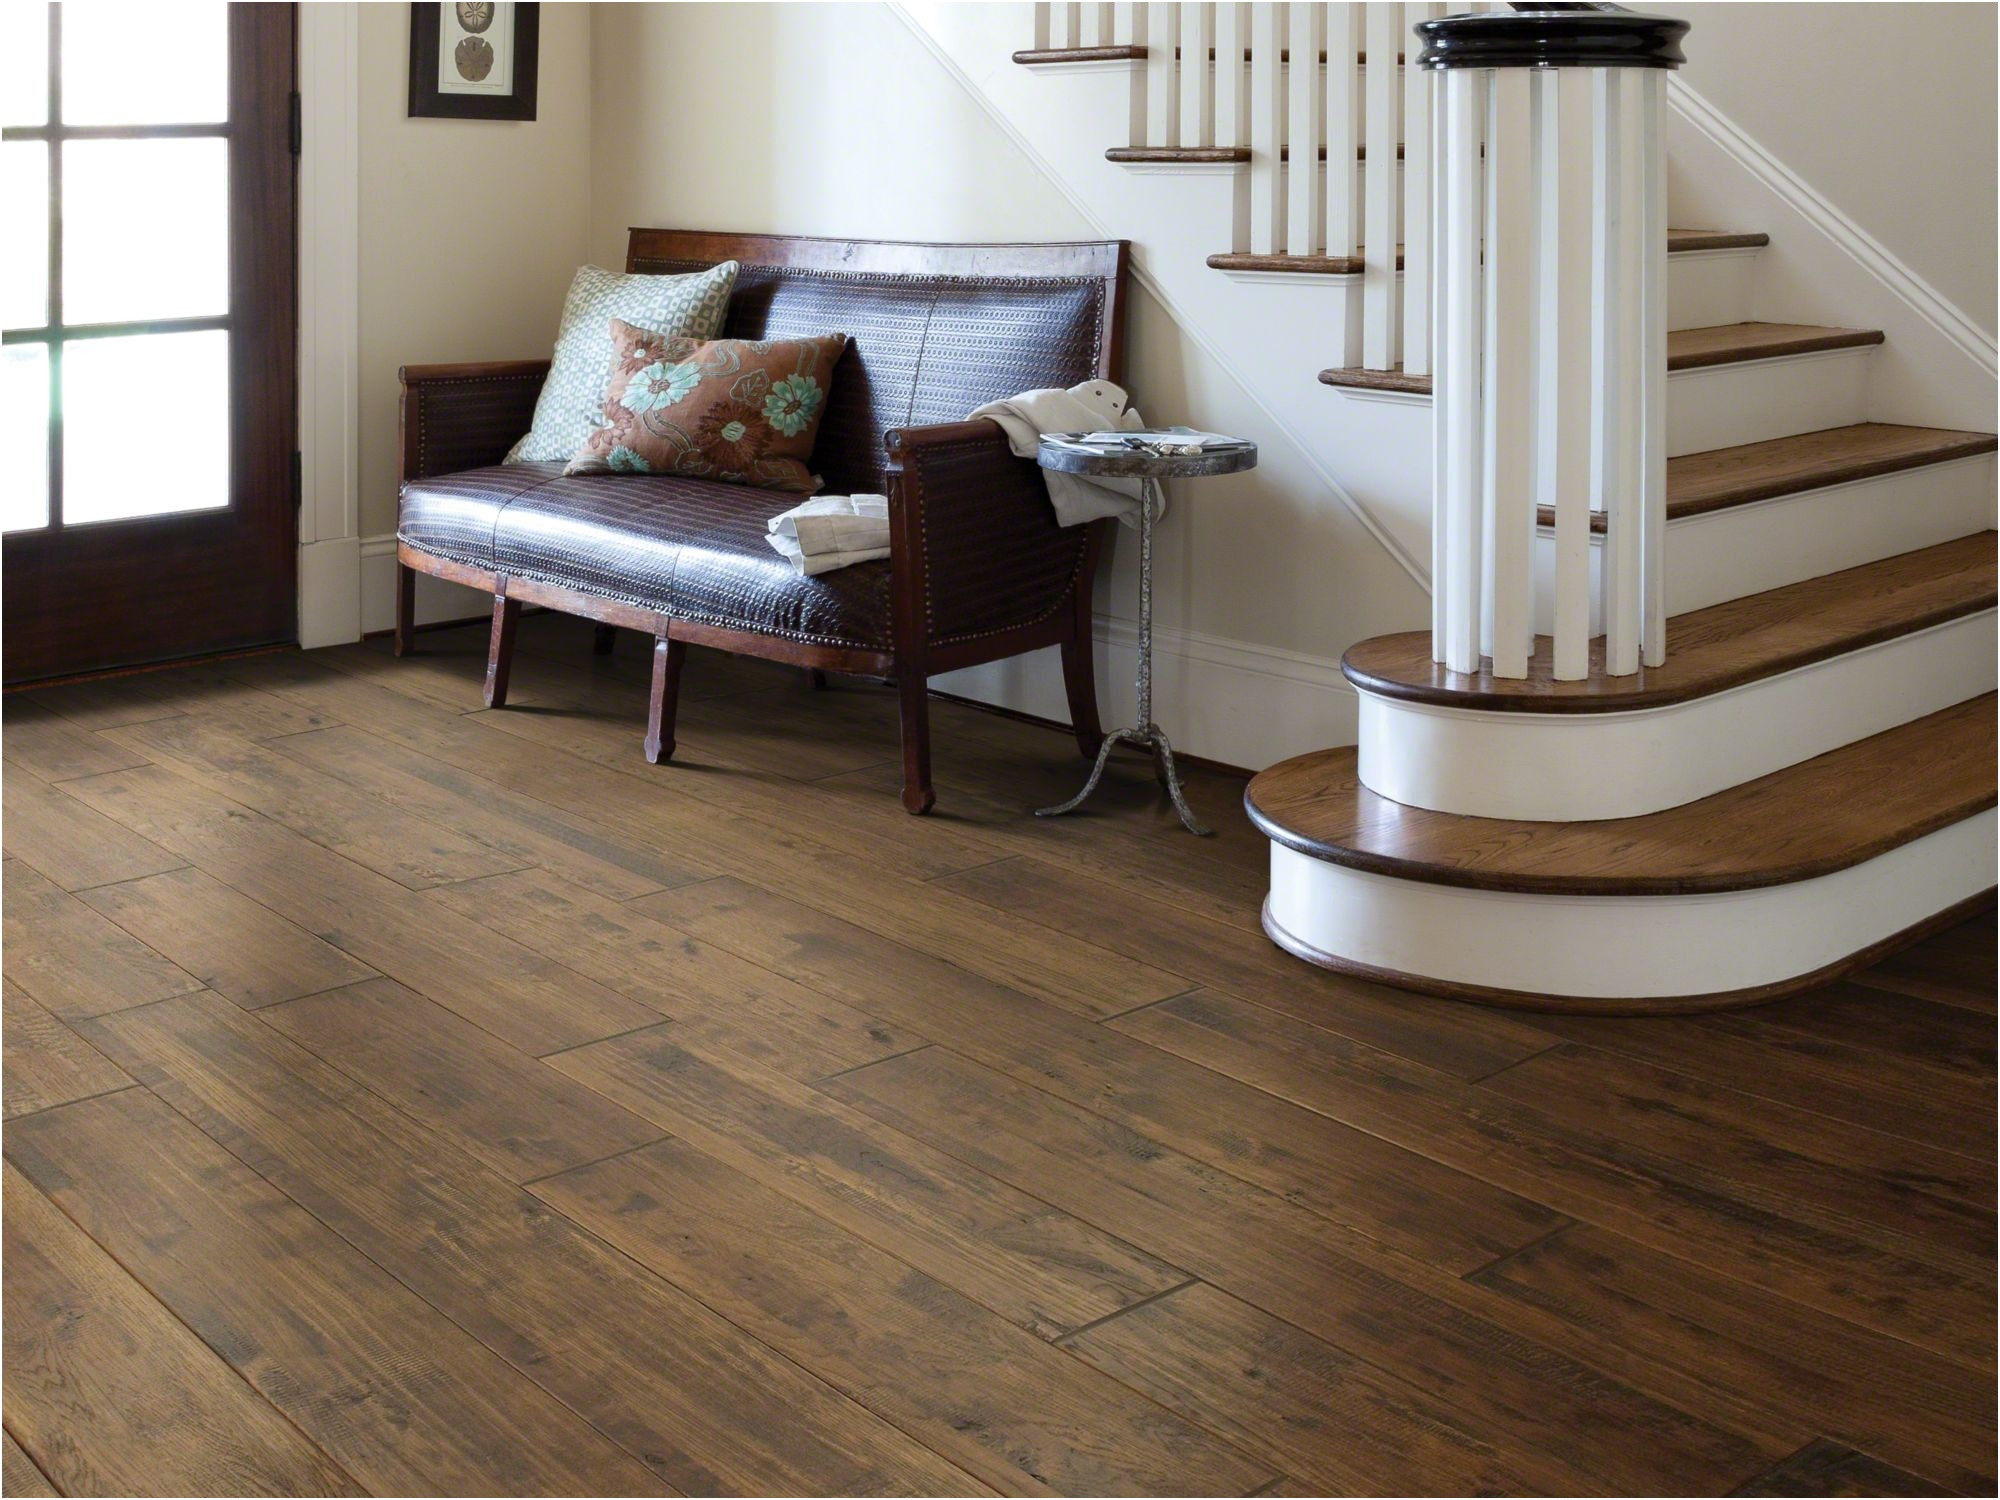 28 Nice Installing Engineered Hardwood Flooring In